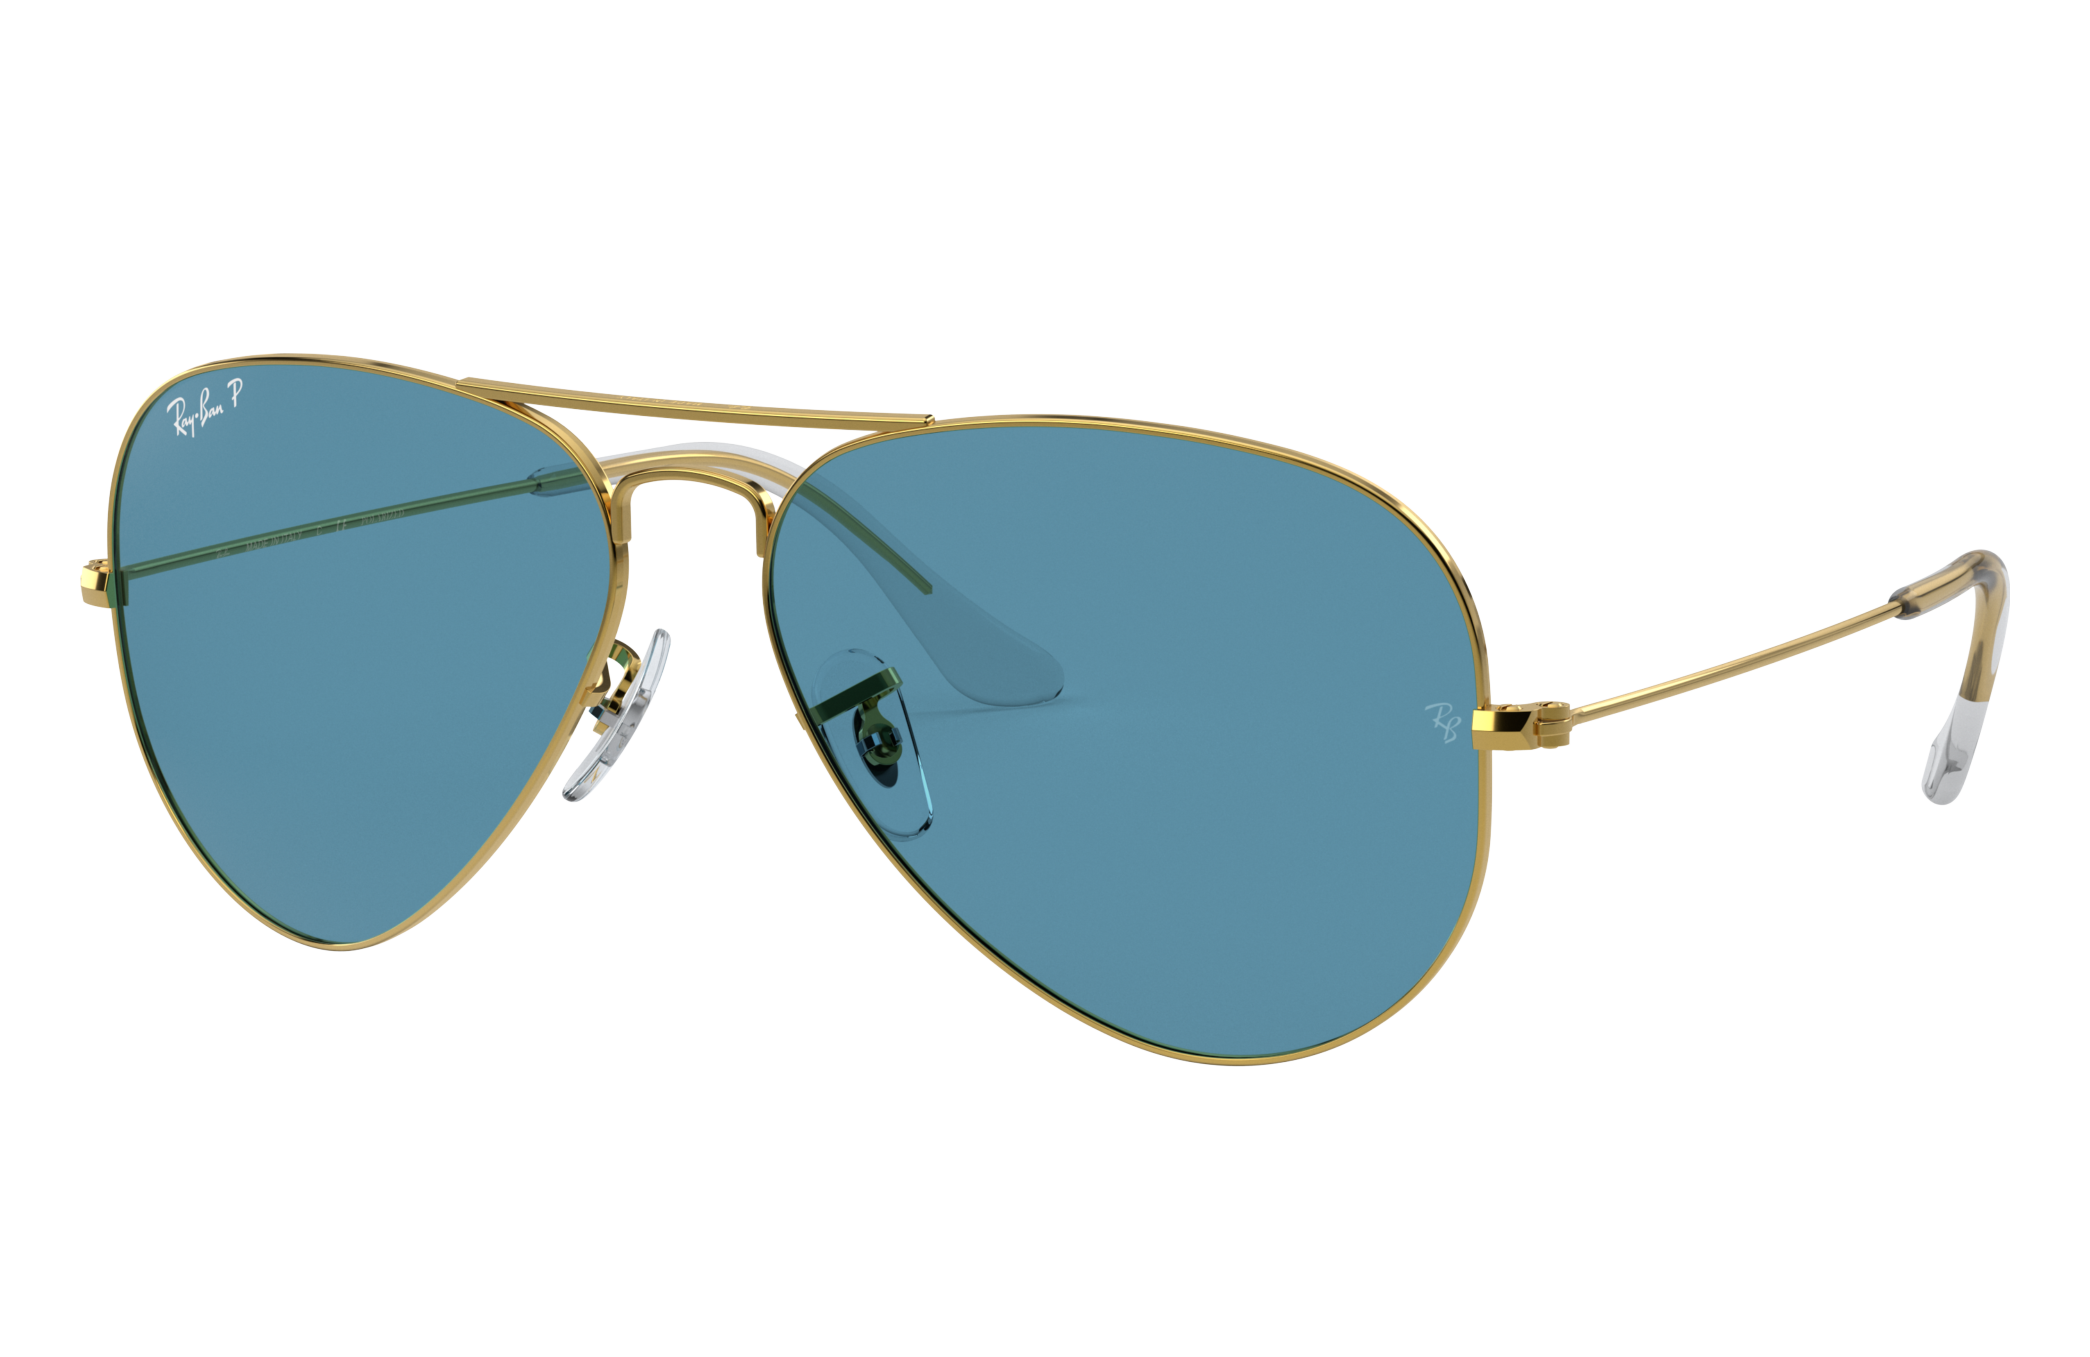 Ray Ban Aviator Classic Gold, Polarized Blue Lenses RB3025